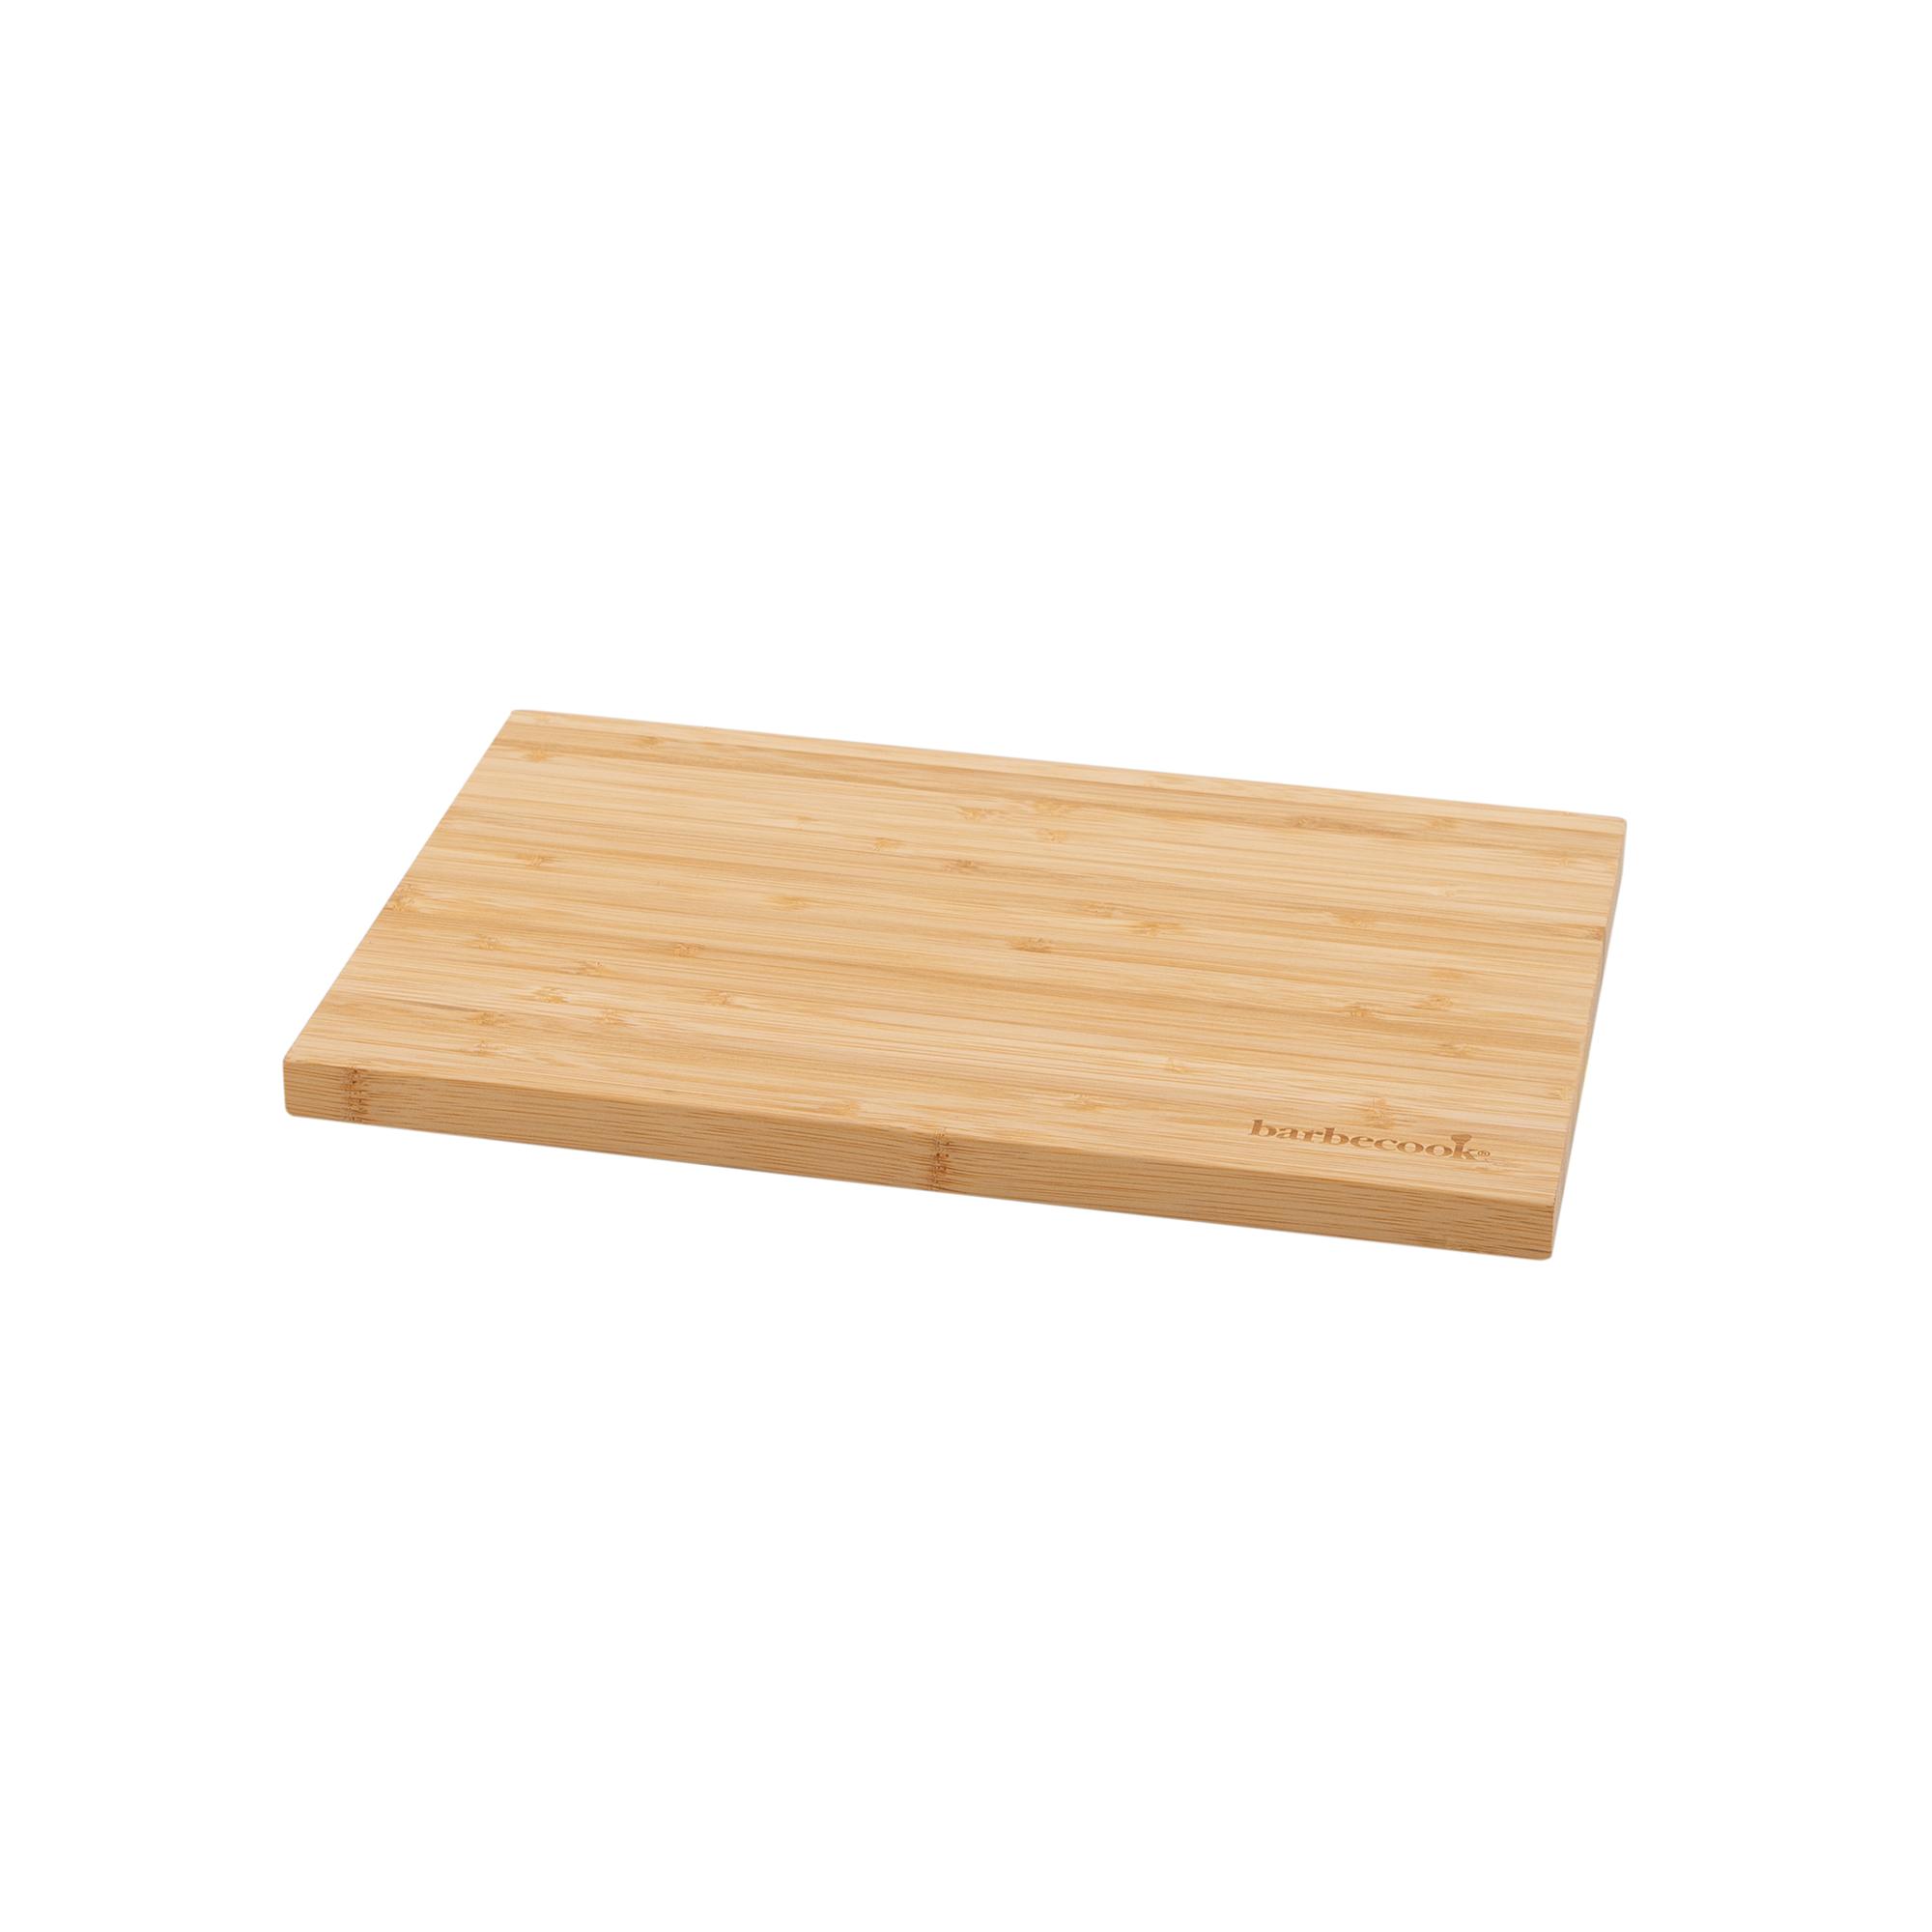 Barbecook bamboo cutting board 30x20x1.5cm